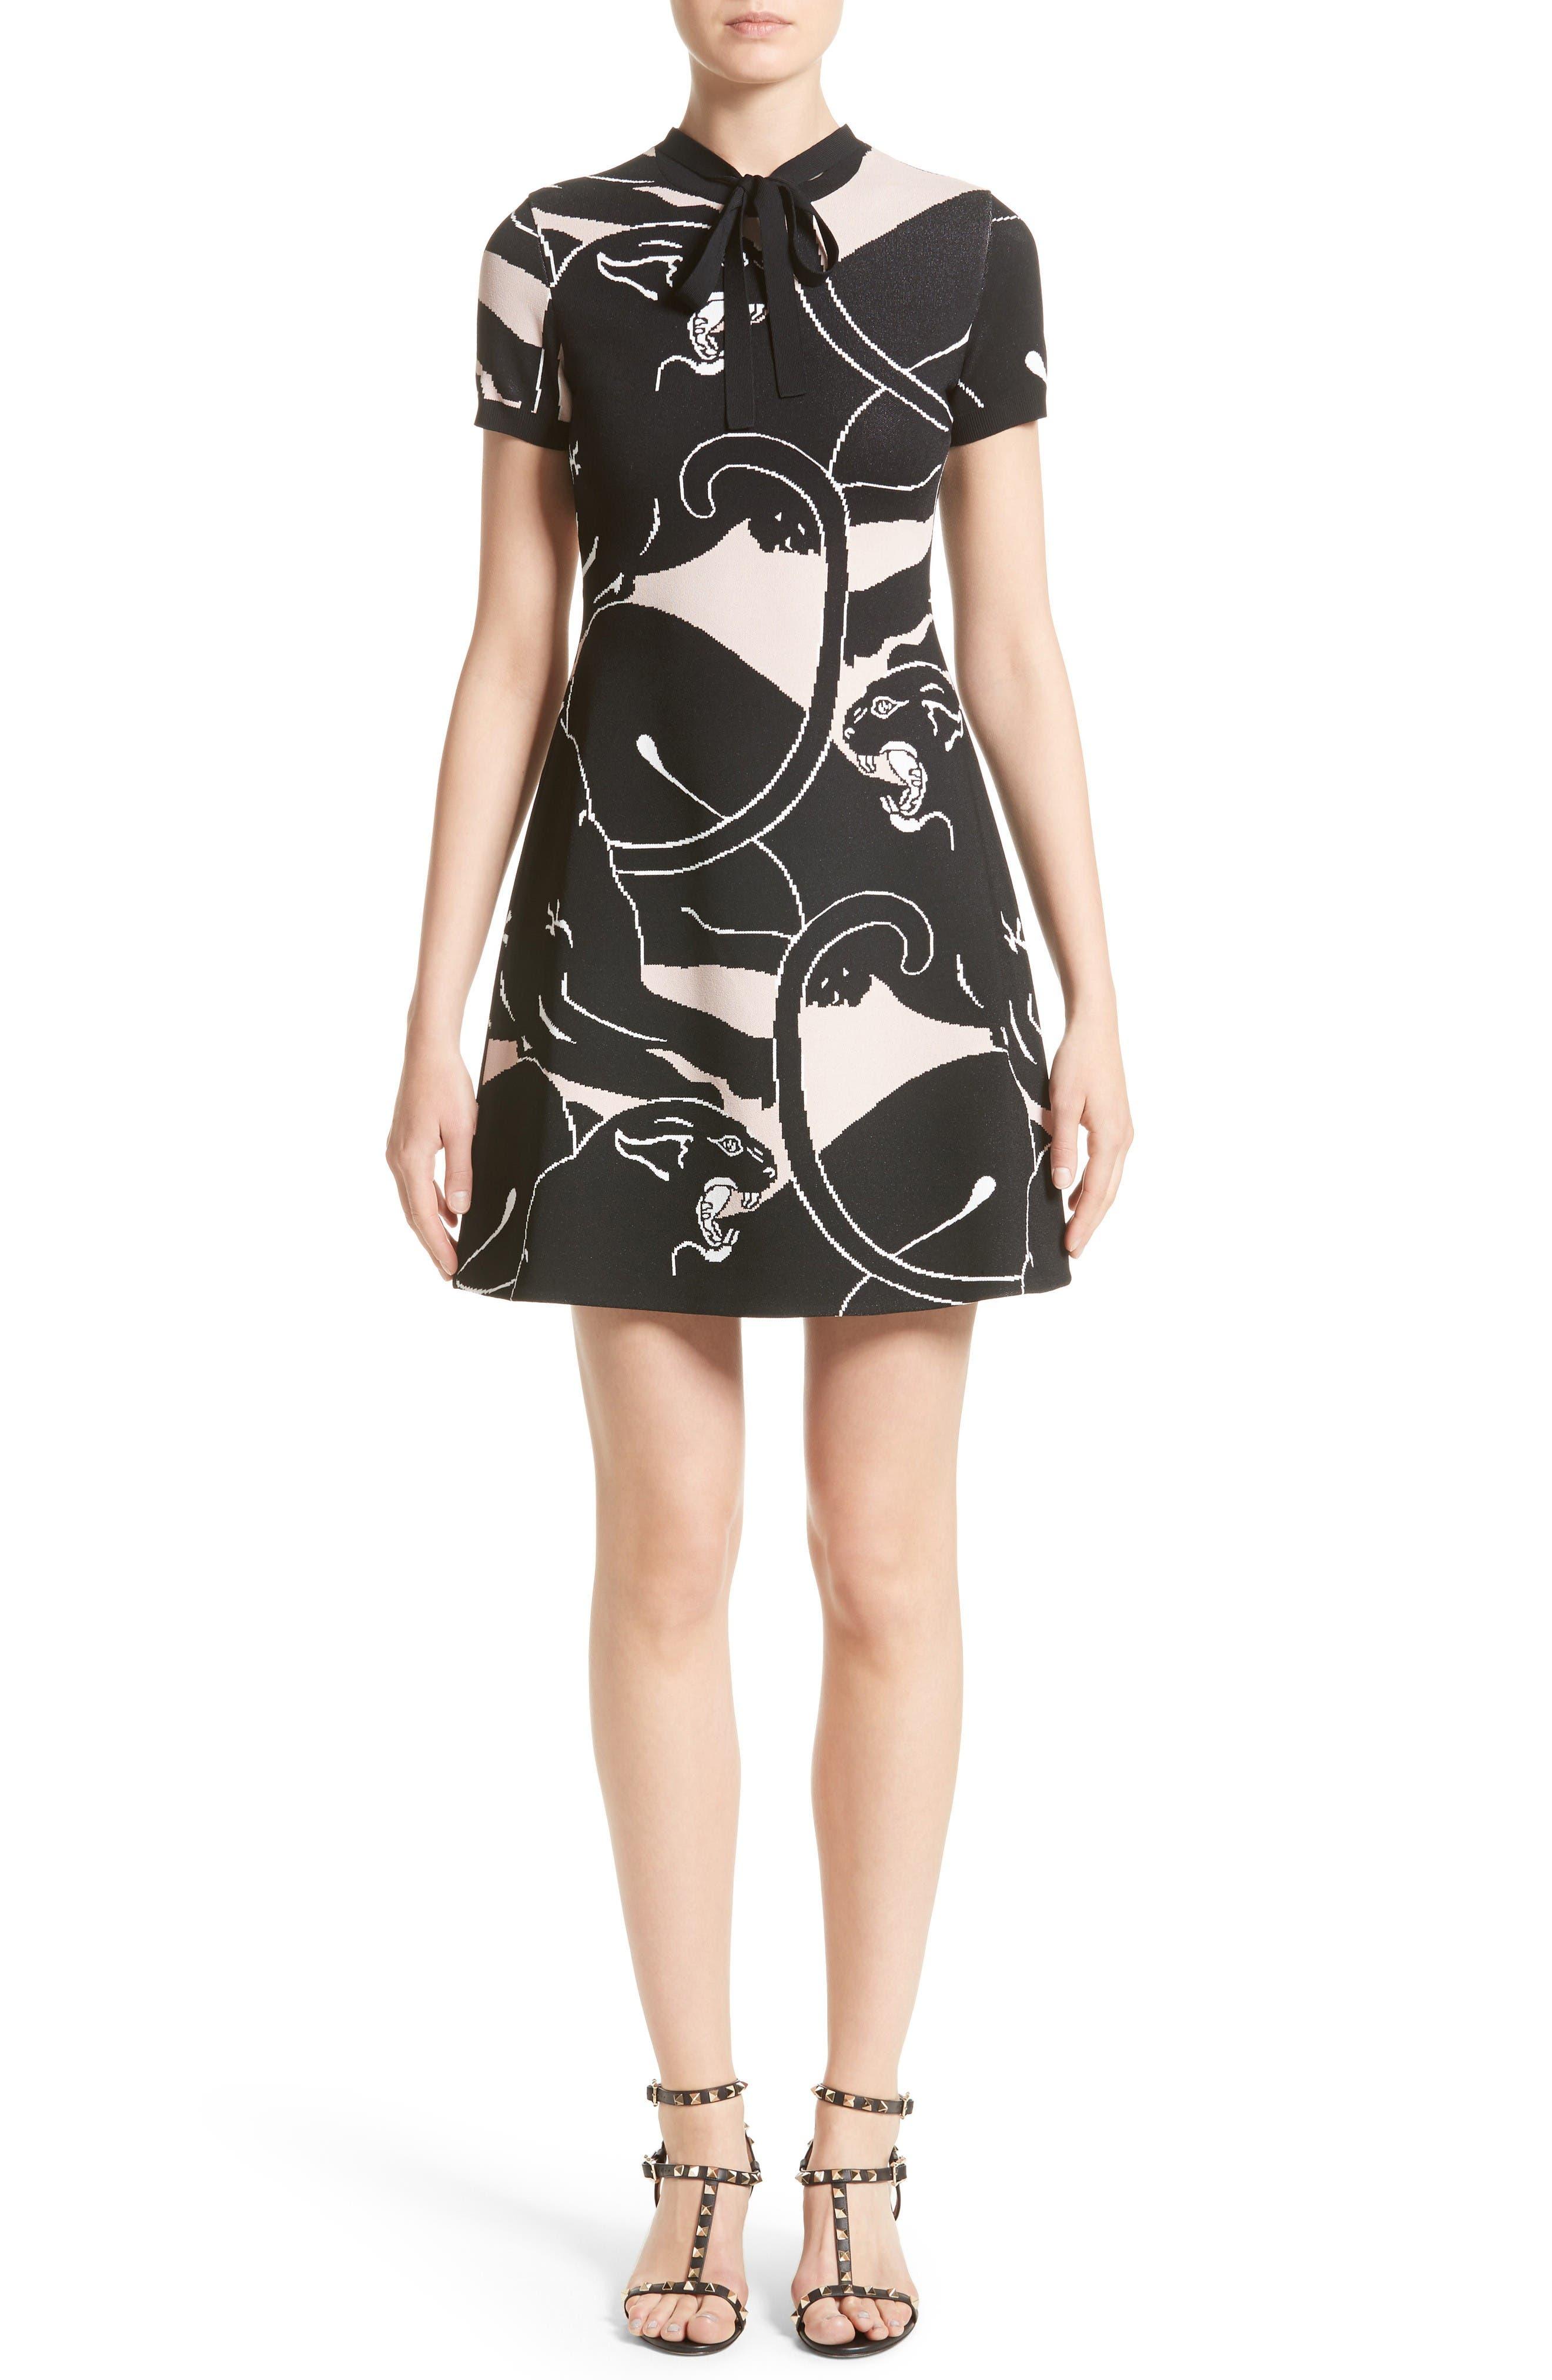 Jacquard Panther Print Dress,                         Main,                         color, Wild Rose/ Black